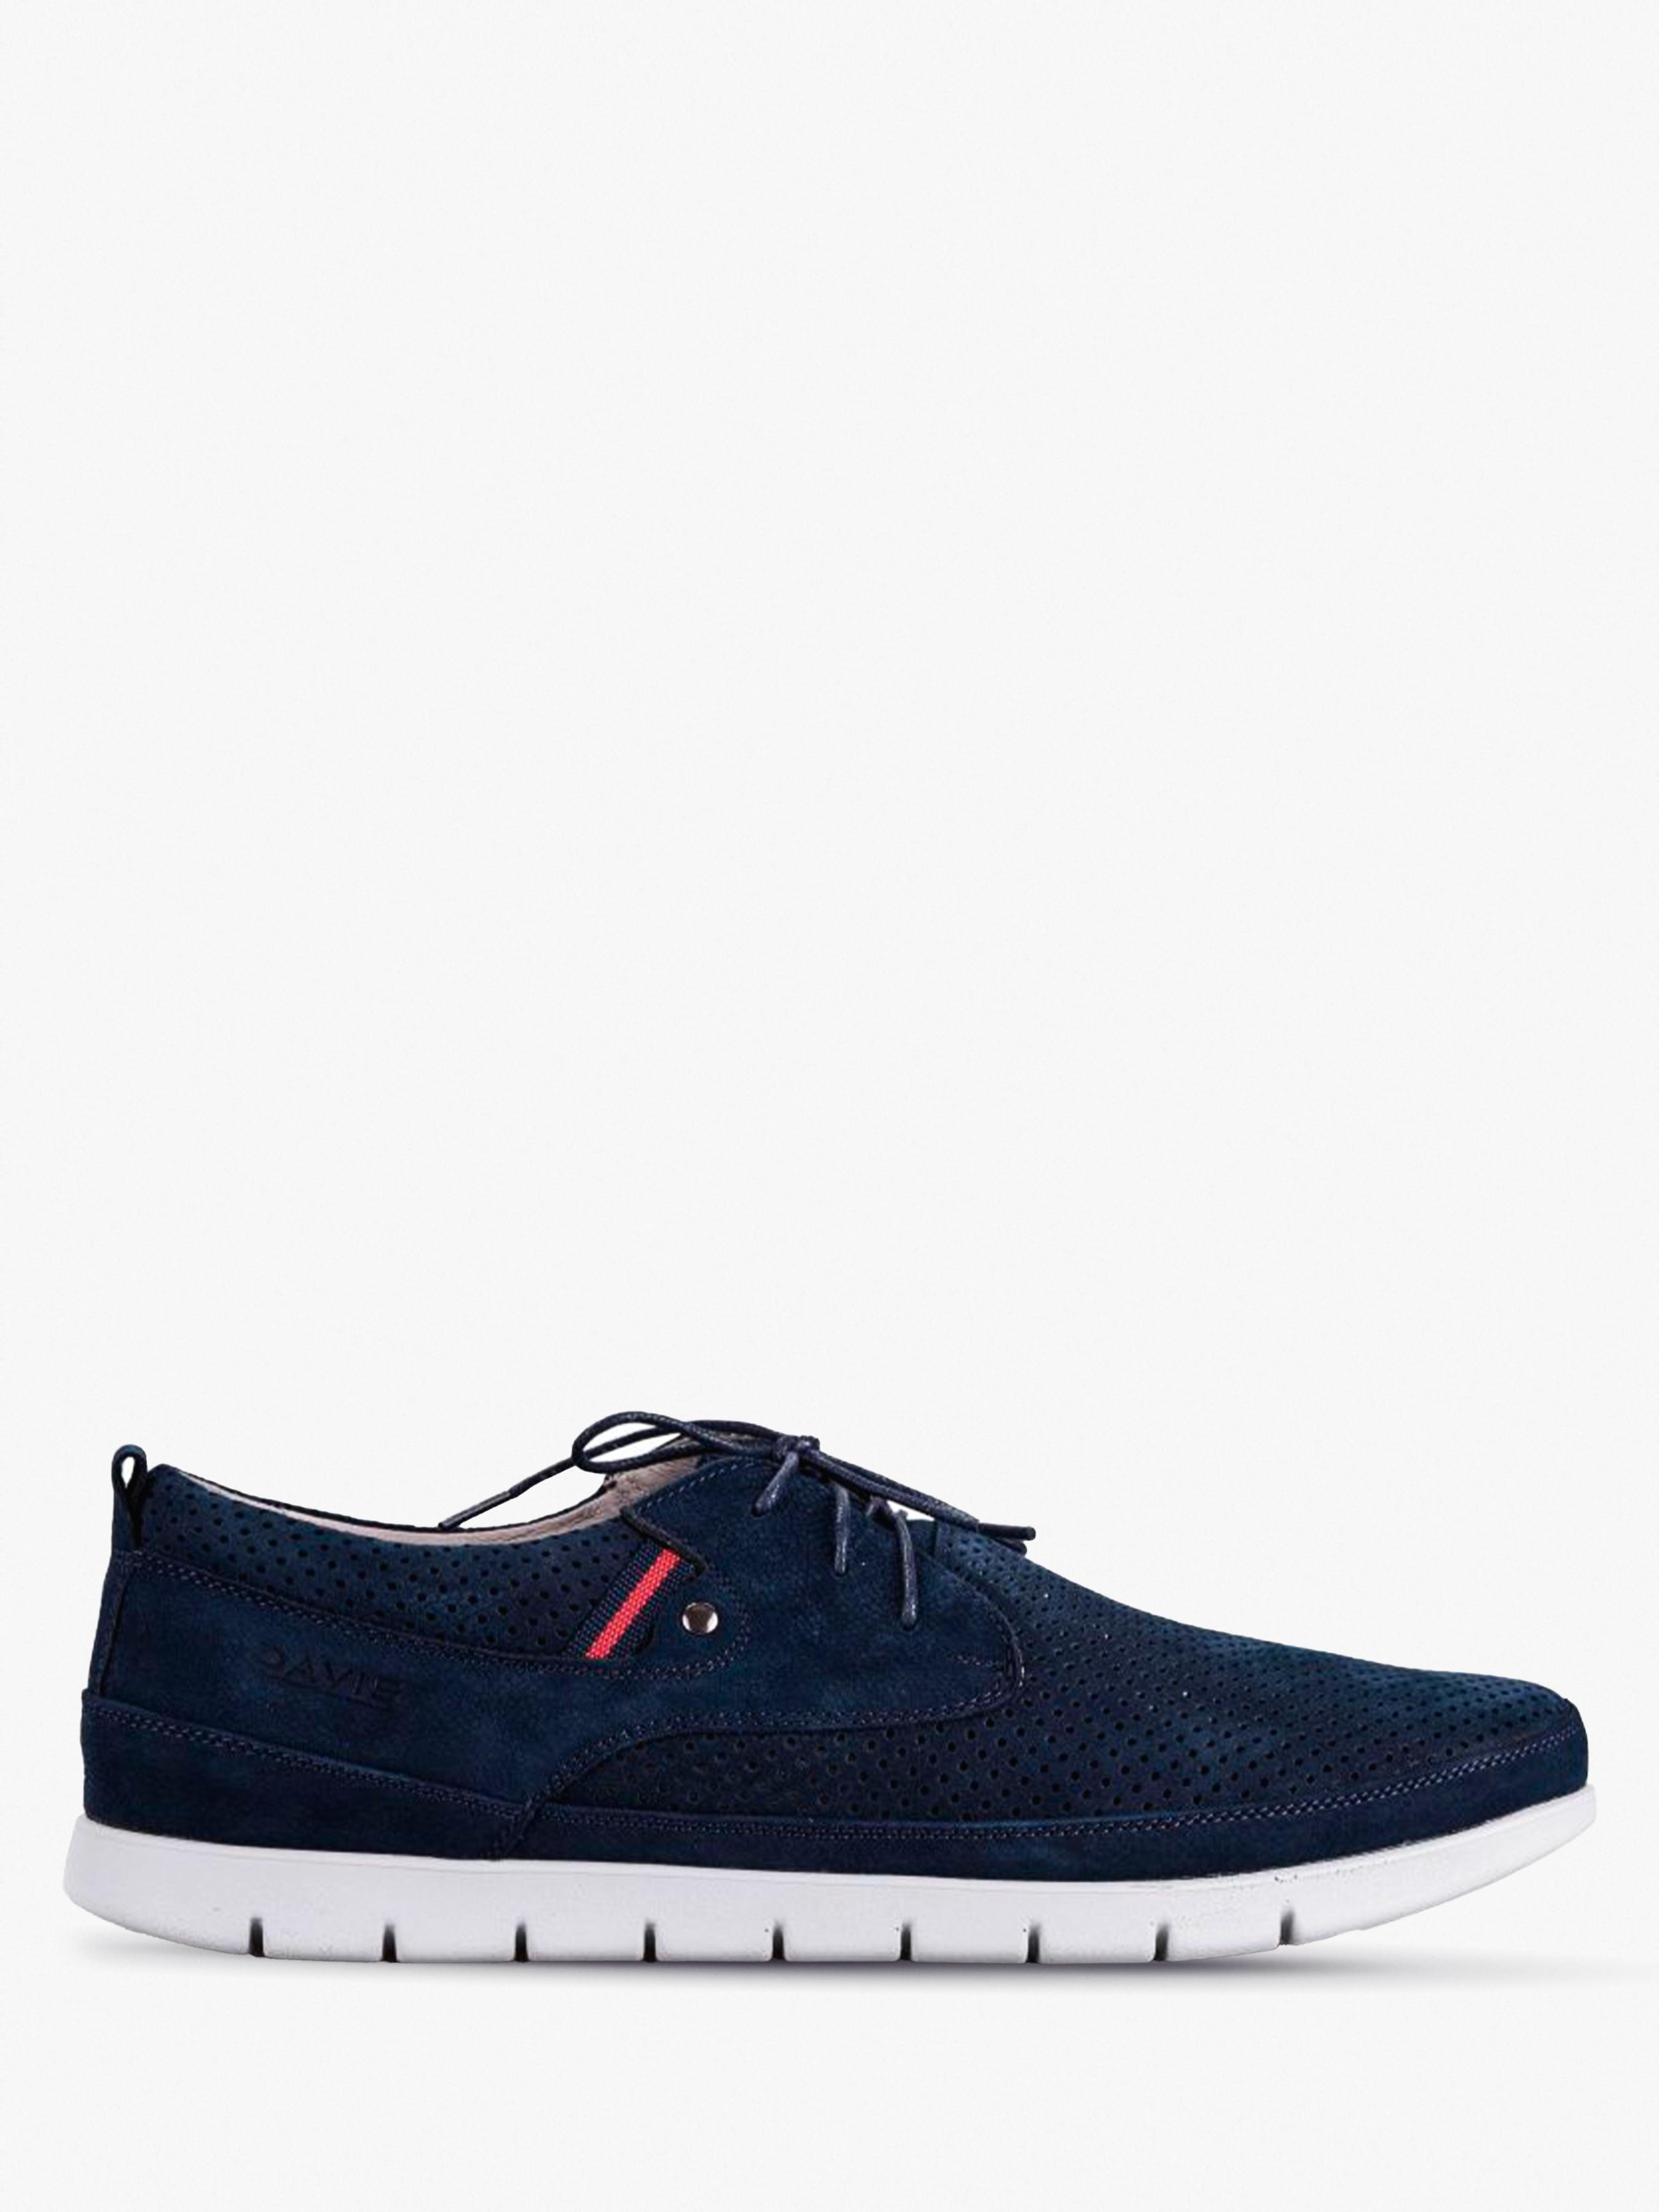 Купить Полуботинки мужские Davis dynamic shoes 9O57, Синий